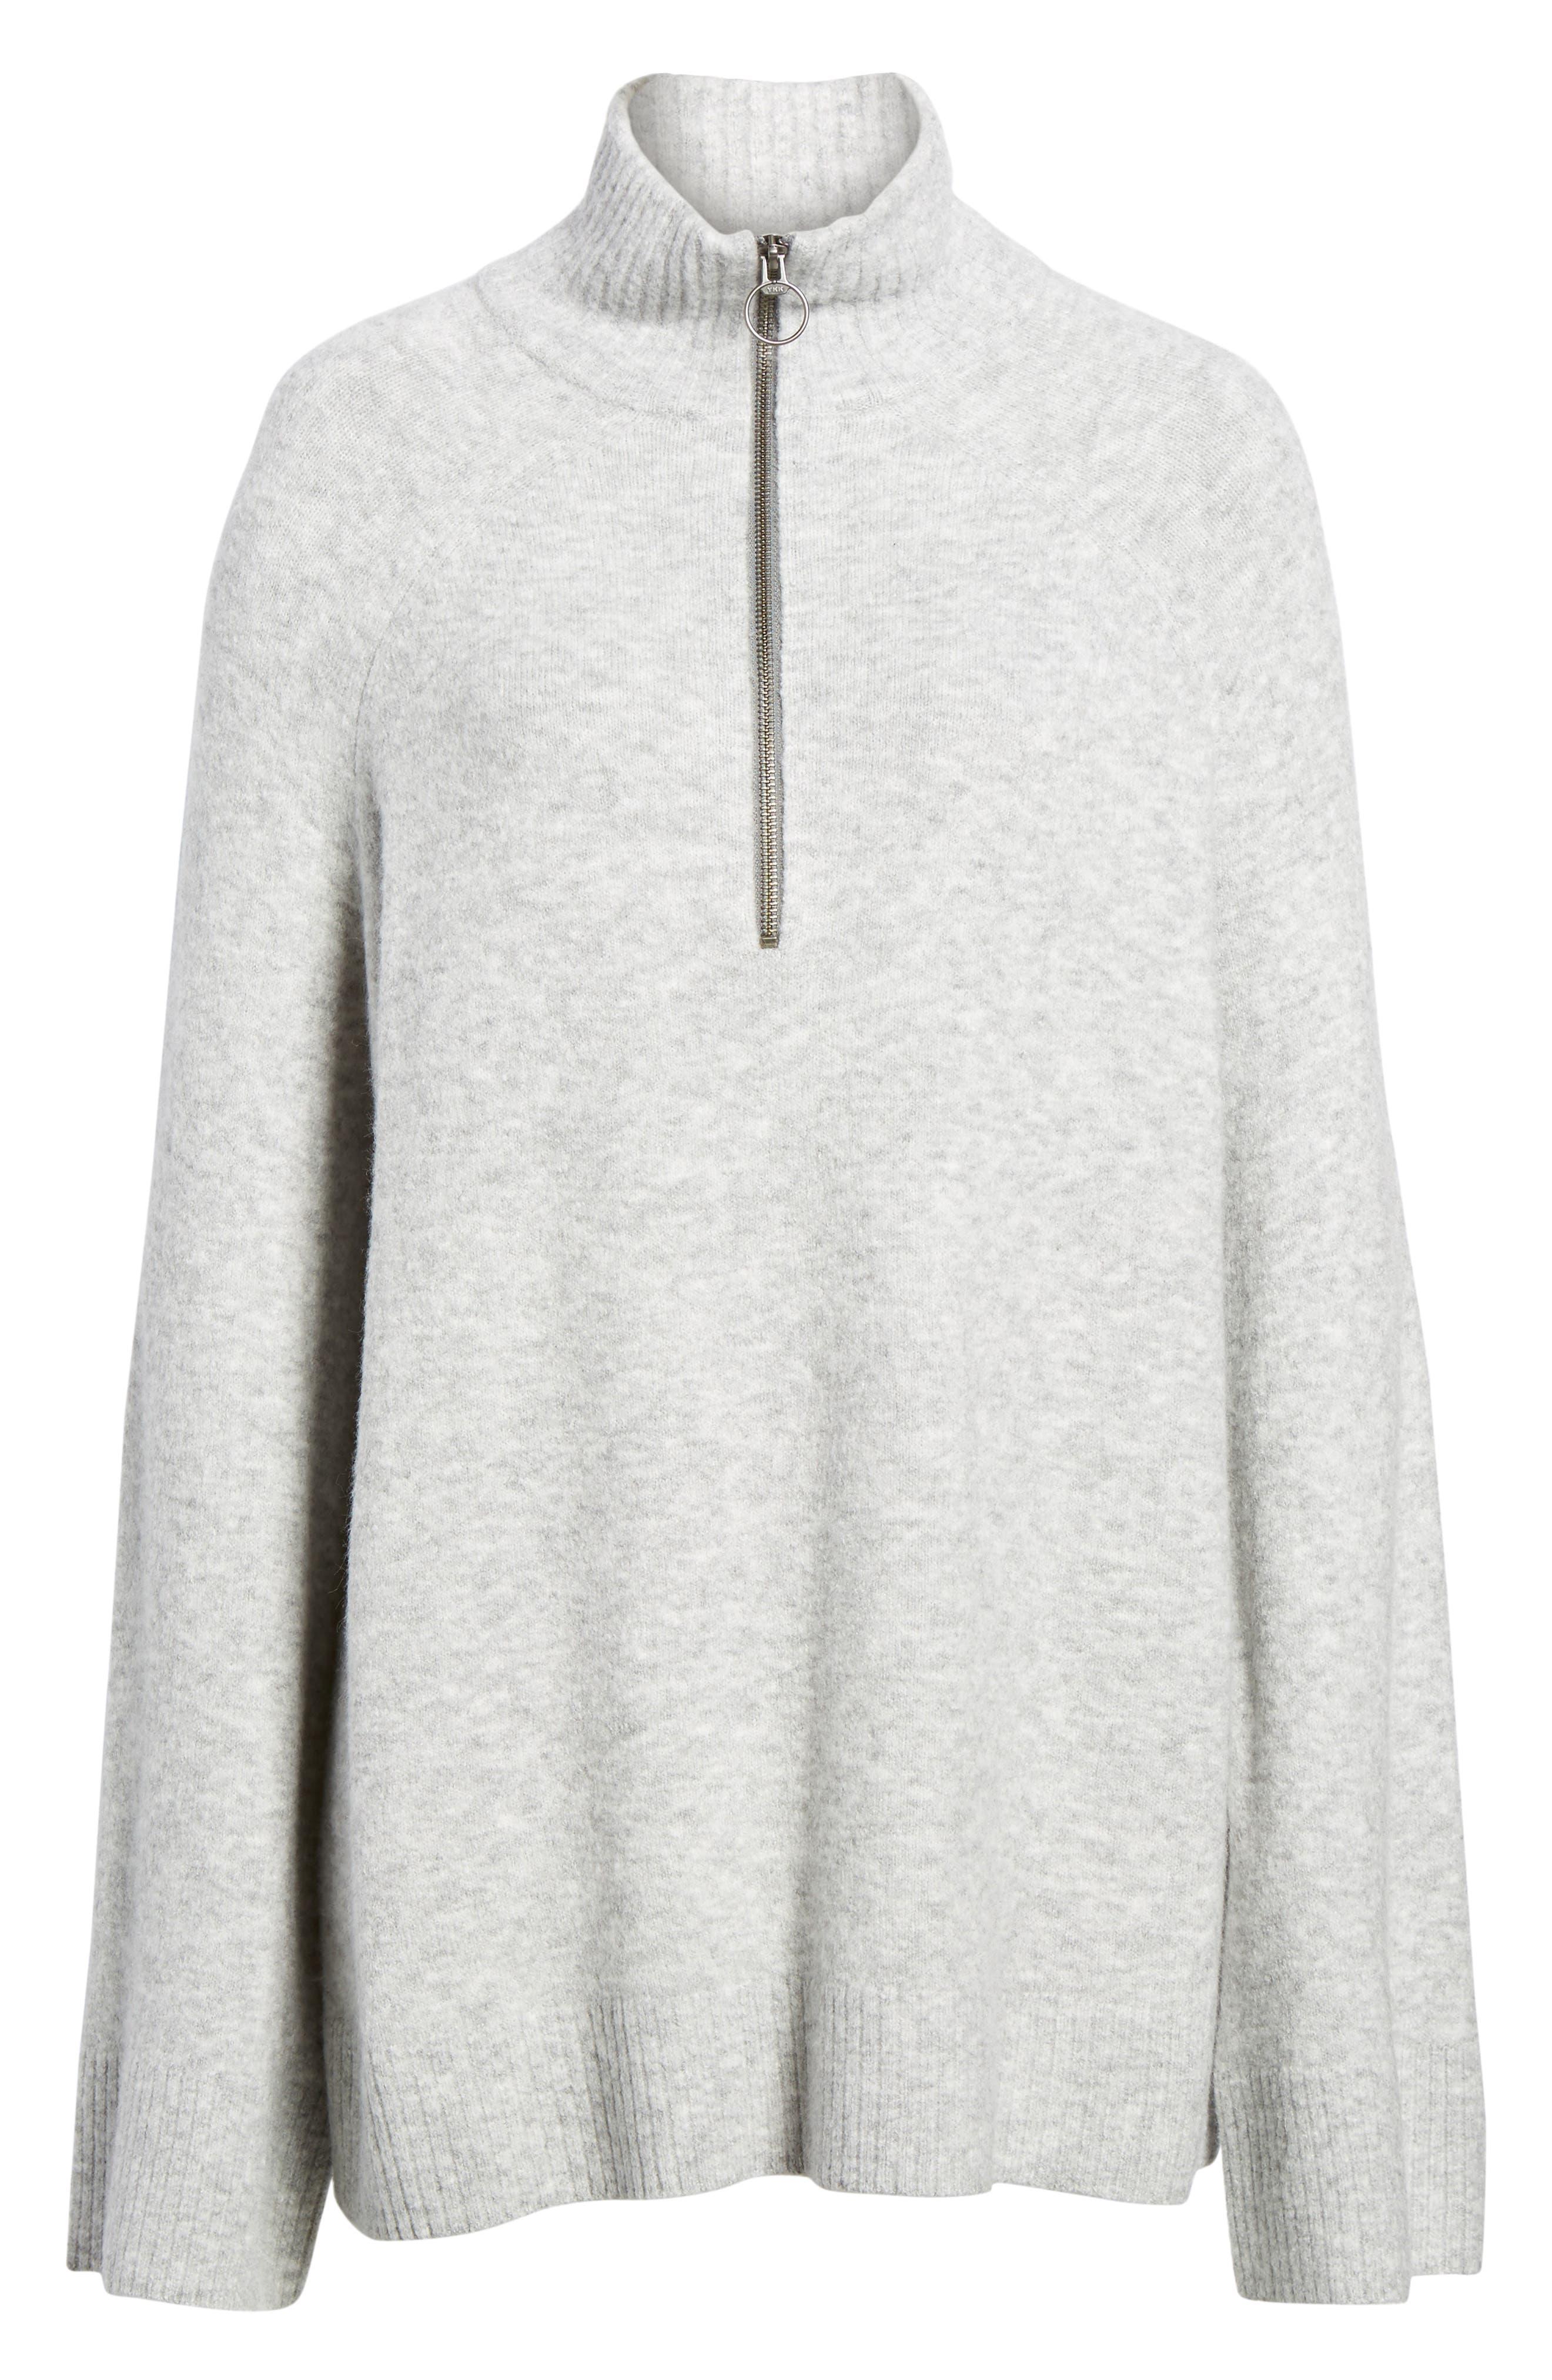 Half Zip Pullover,                             Alternate thumbnail 6, color,                             Grey Heather